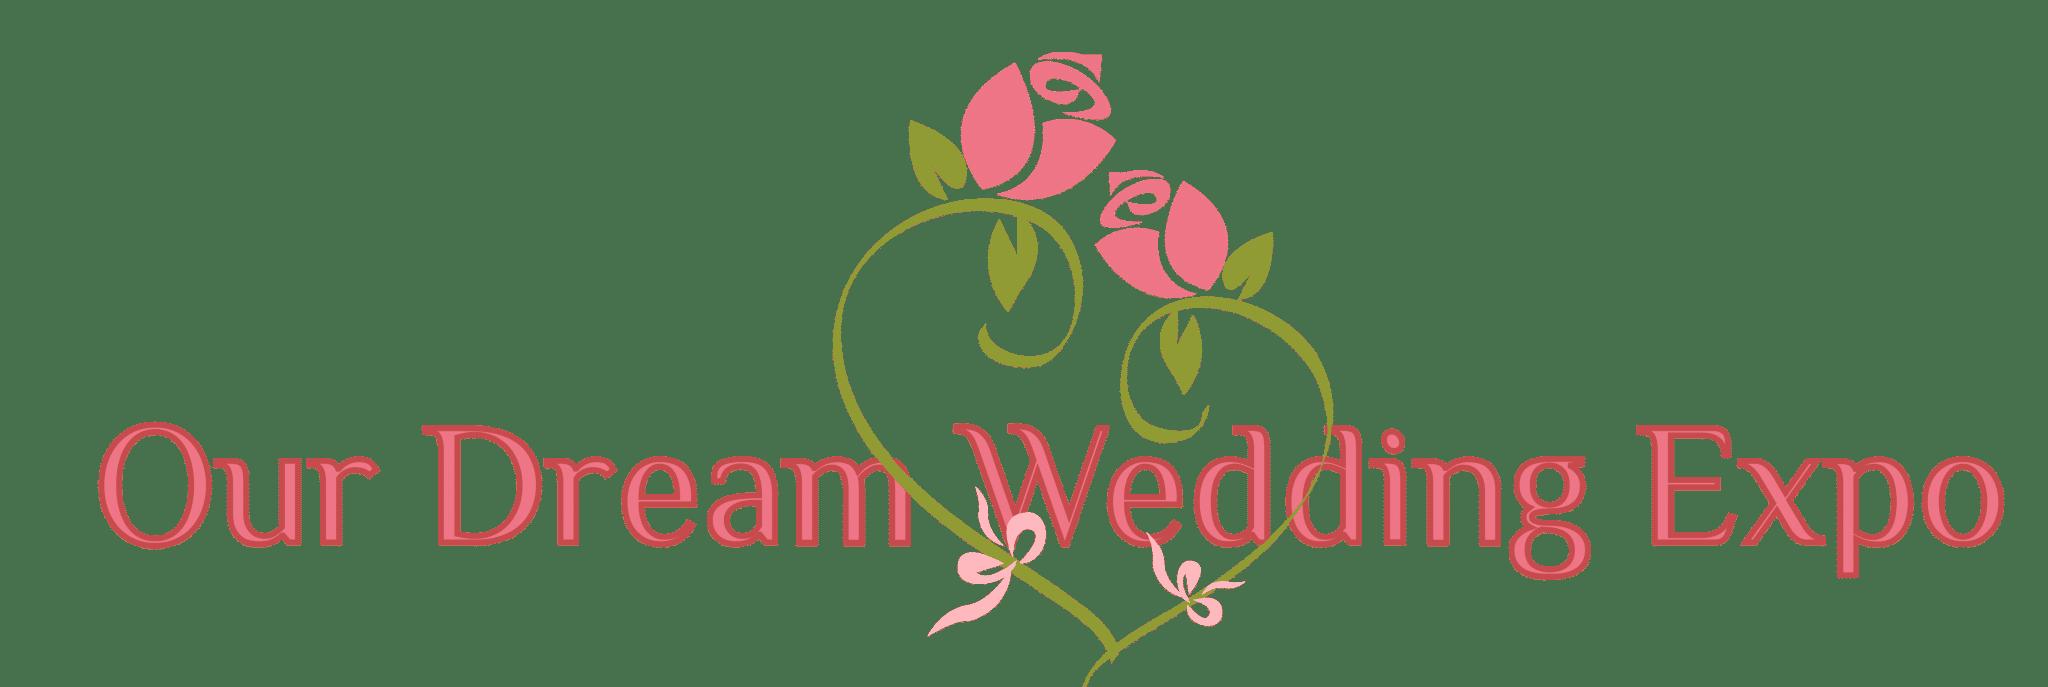 Our Dream Wedding banner logo